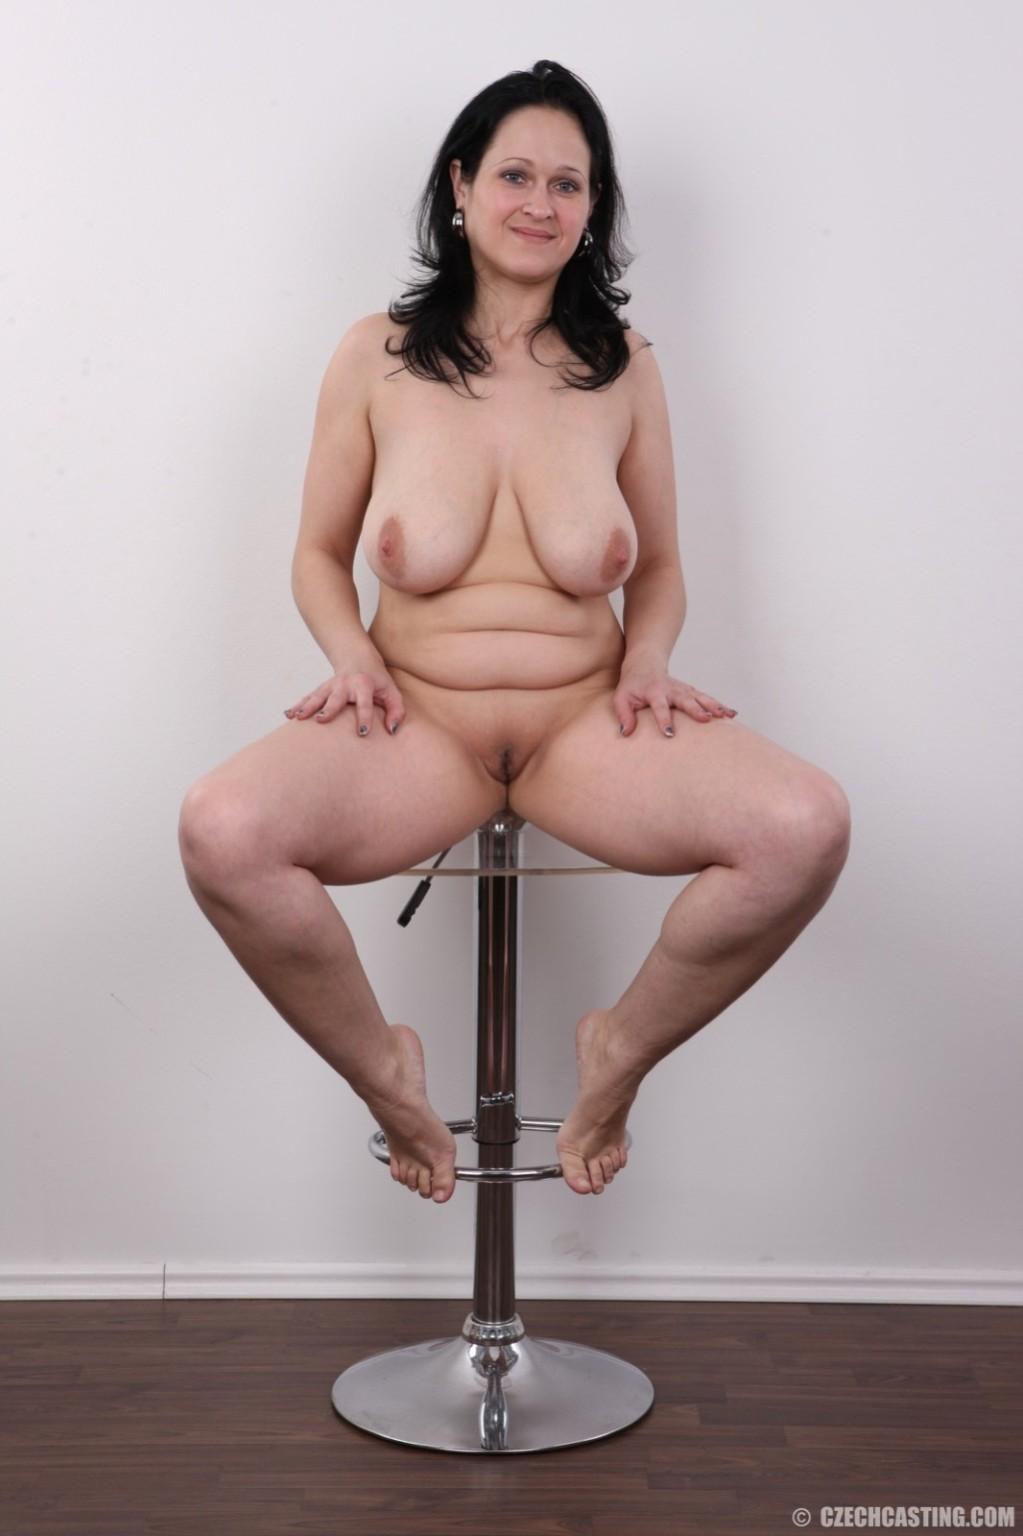 Czech nude milf picture gallery